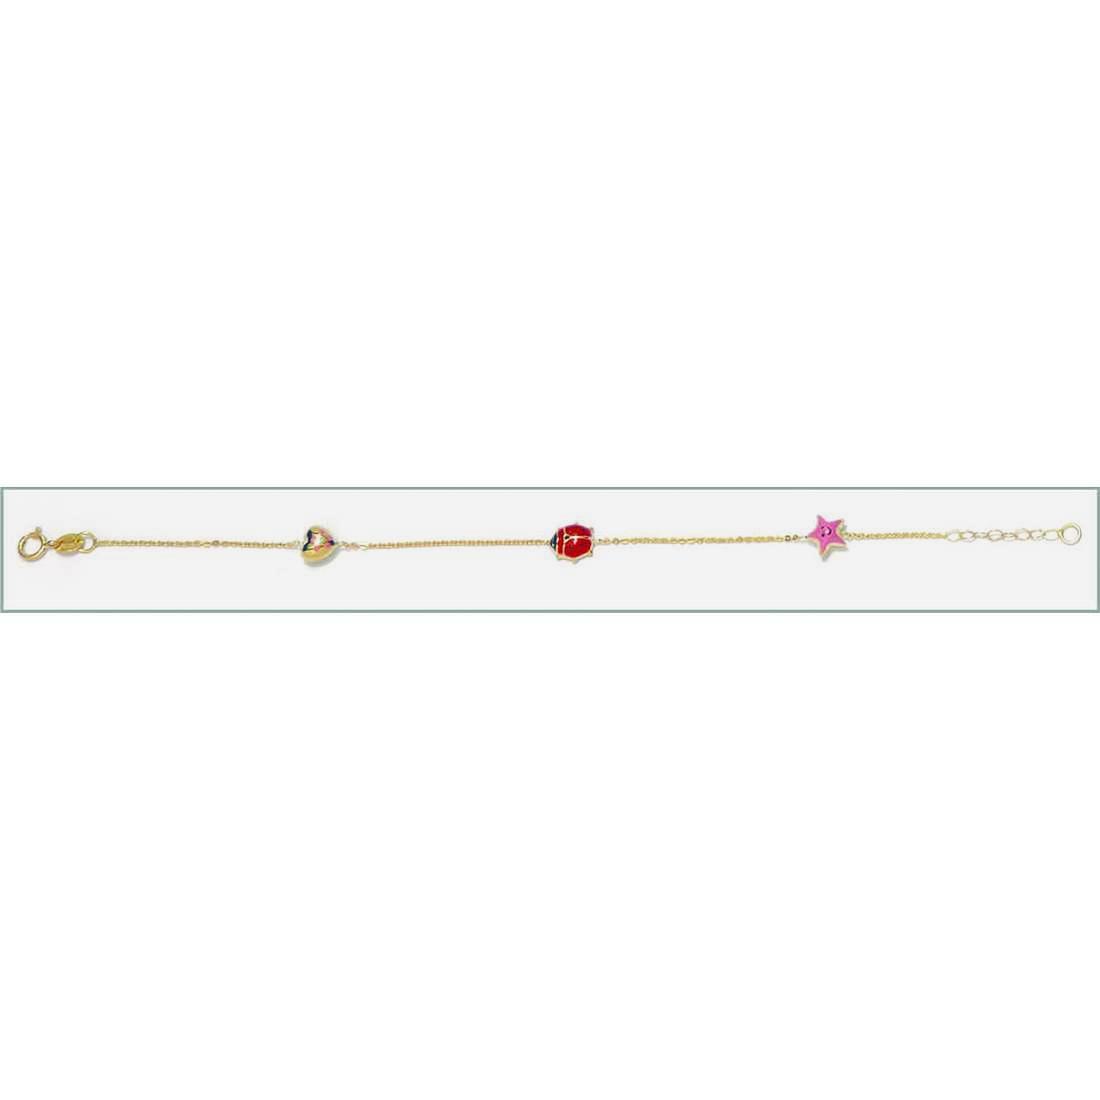 bracelet unisex jewellery Facco Gioielli 717549